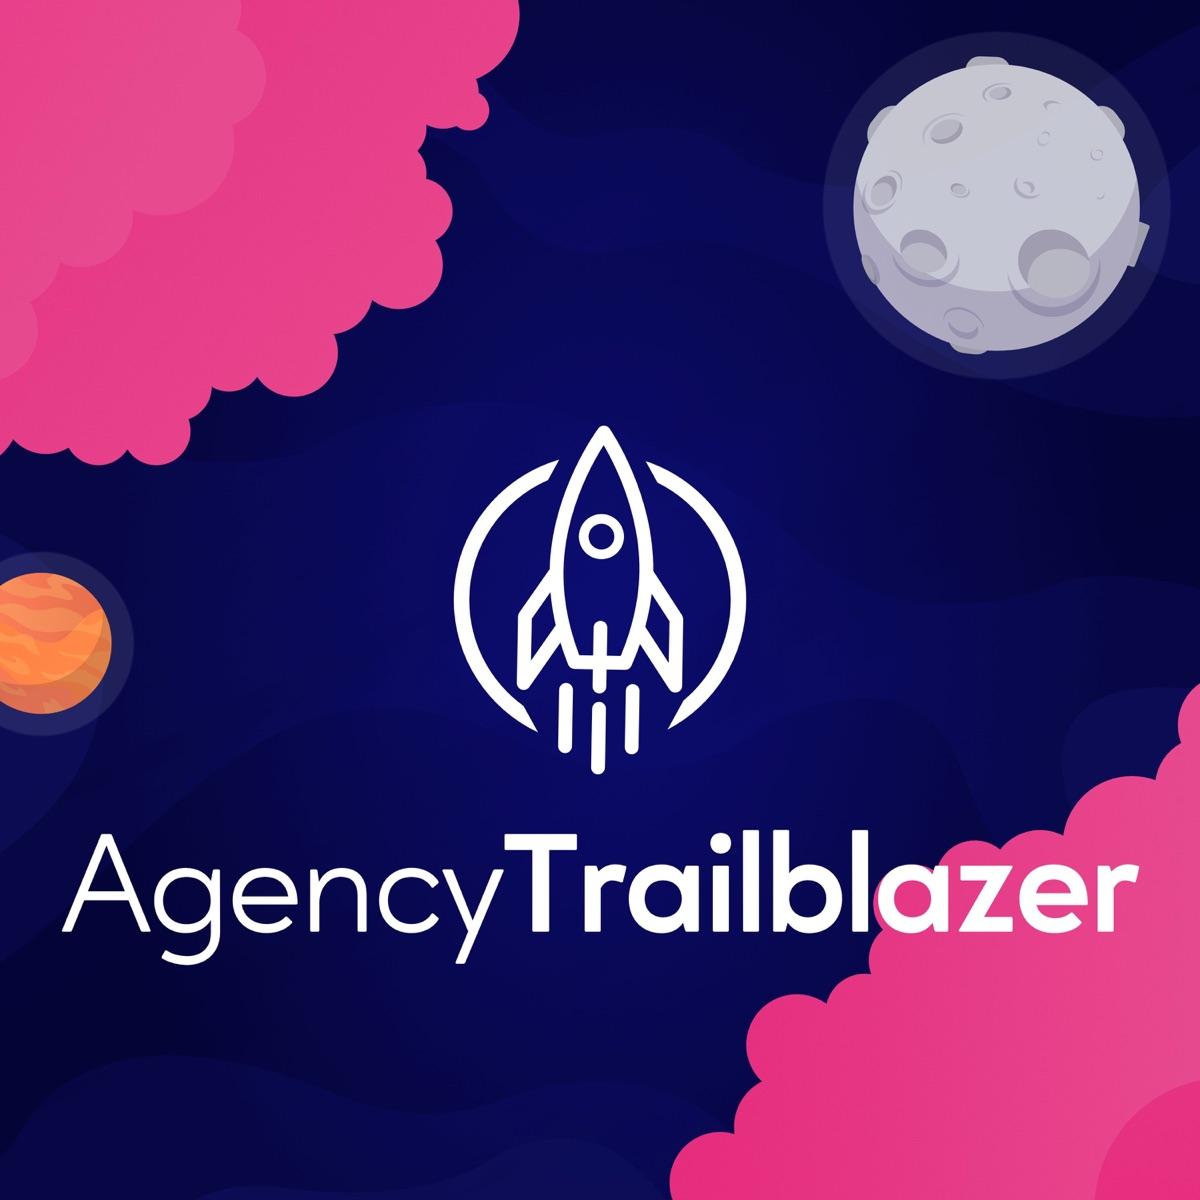 Agency Trailblazer Podcast The Web Design Podcast Podcast Podtail